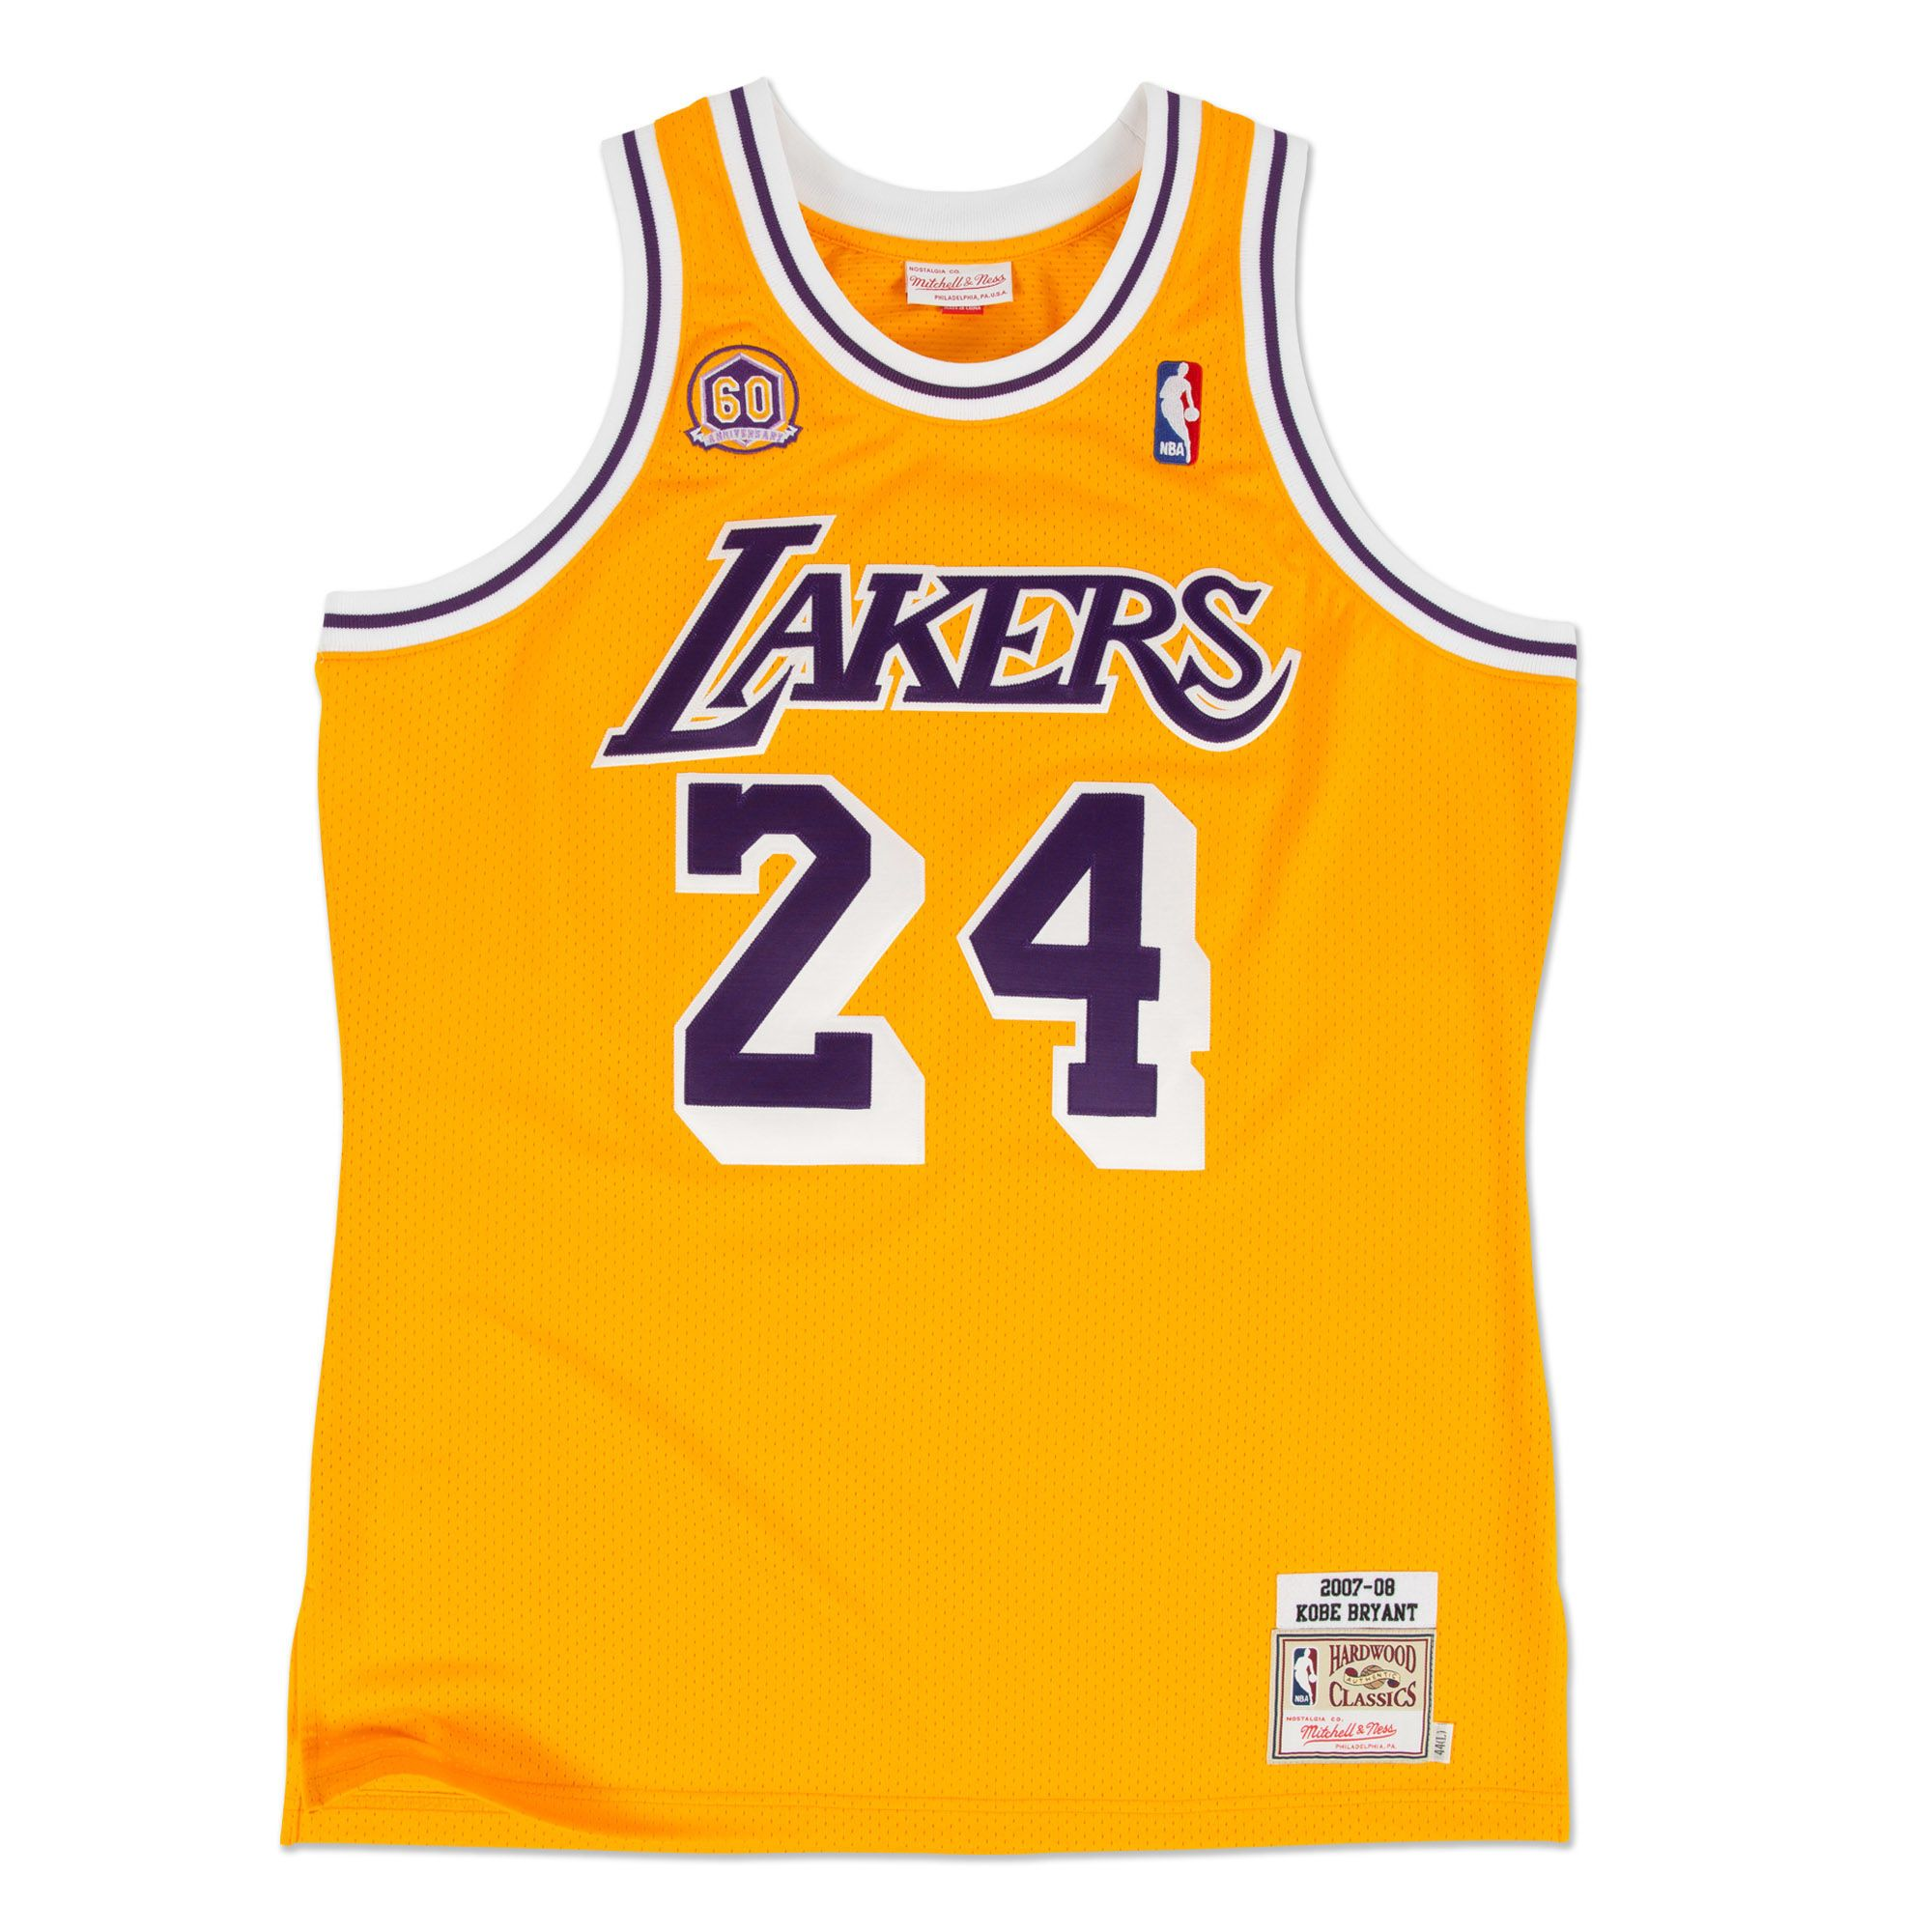 Kobe Bryant 2007 08 Authentic Jersey Los Angeles Lakers Mitchell Ness Nostalgia Co Kobe Bryant Kobe Nba Outfit